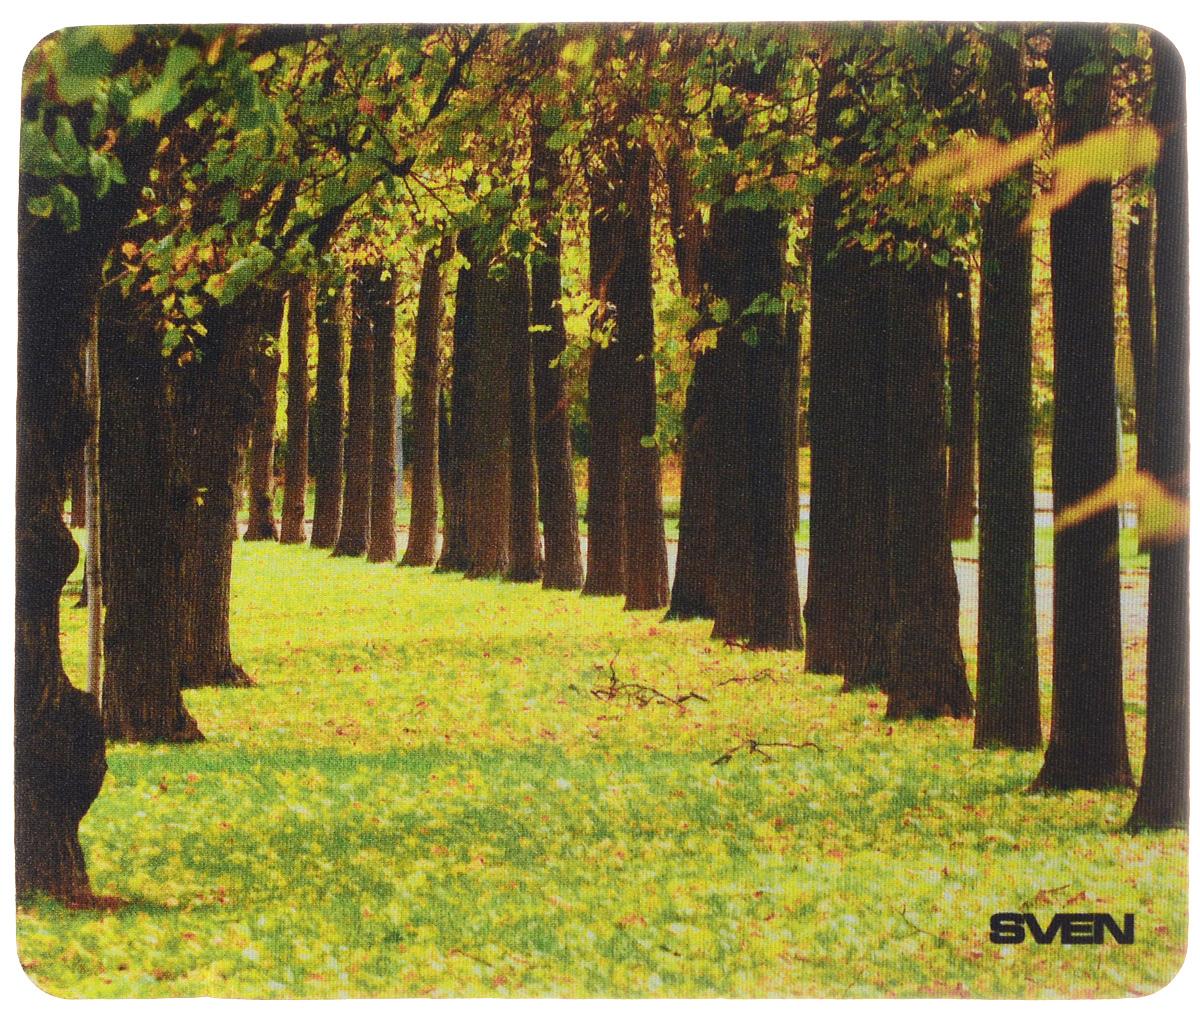 Sven SA, Yellow Brown коврик для мыши коврик для мыши pcpet colorfull nature rgm02 голубой с рисунком 648600